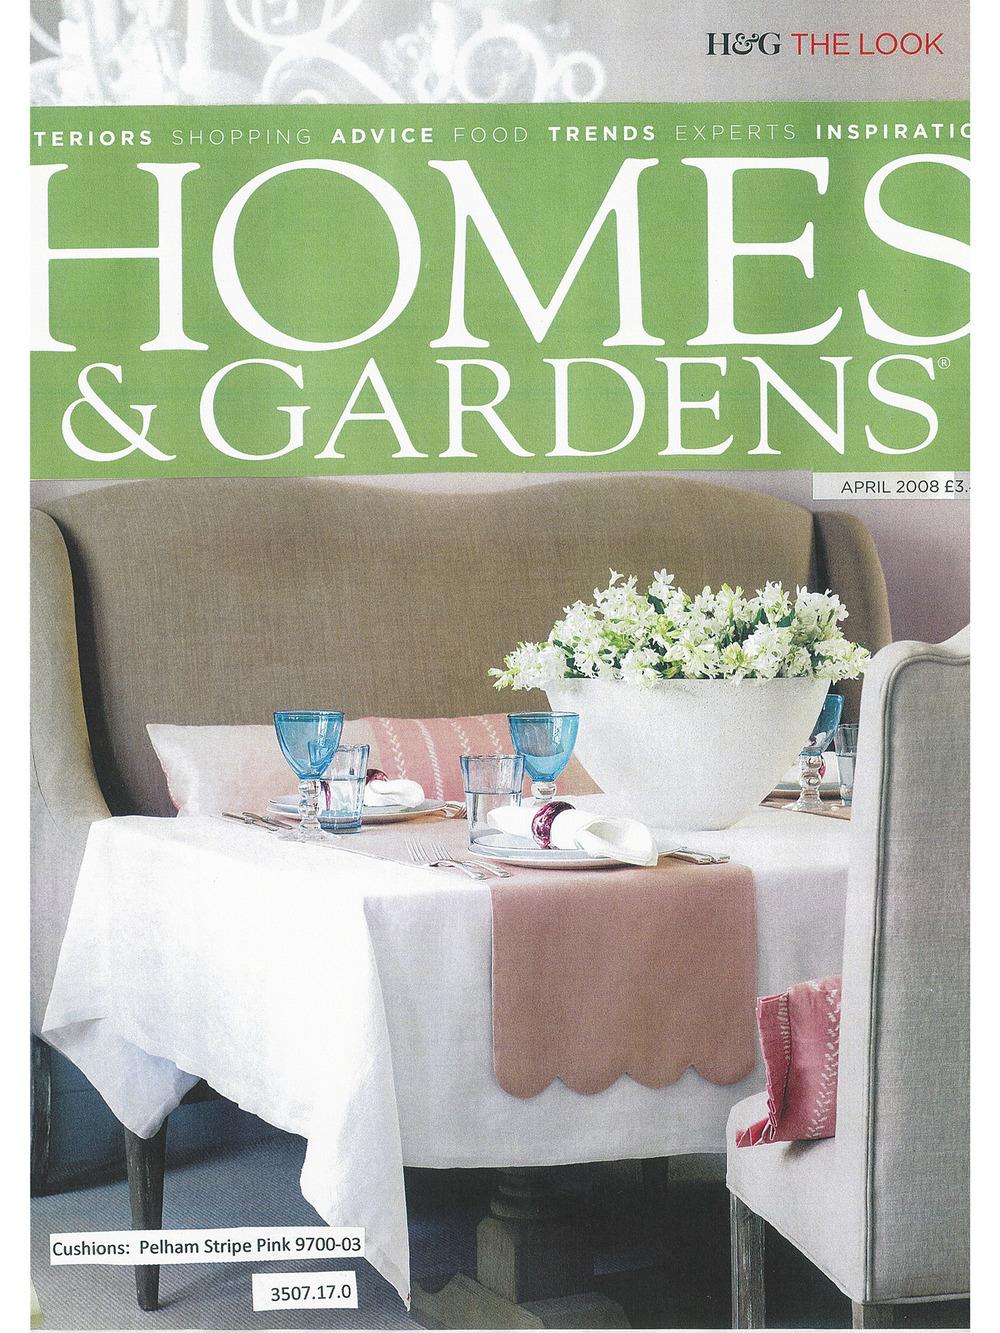 2008 April-Homes & Gardens.jpeg